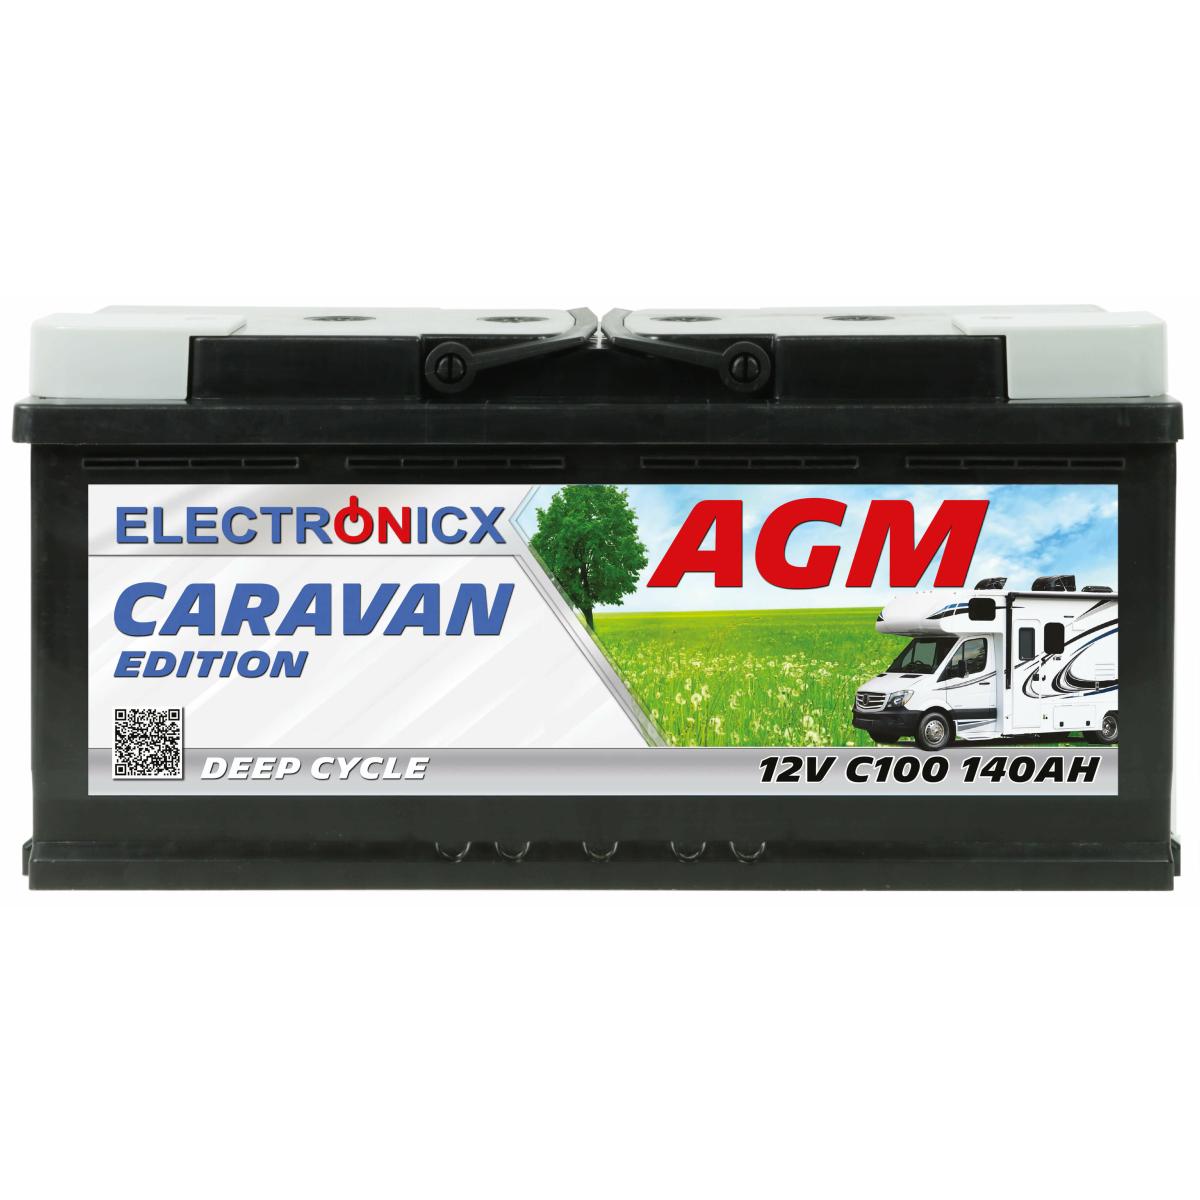 Electronicx Caravan Edition V2 Batterie AGM 140 AH 12V Wohnmobil Boot Versorgung